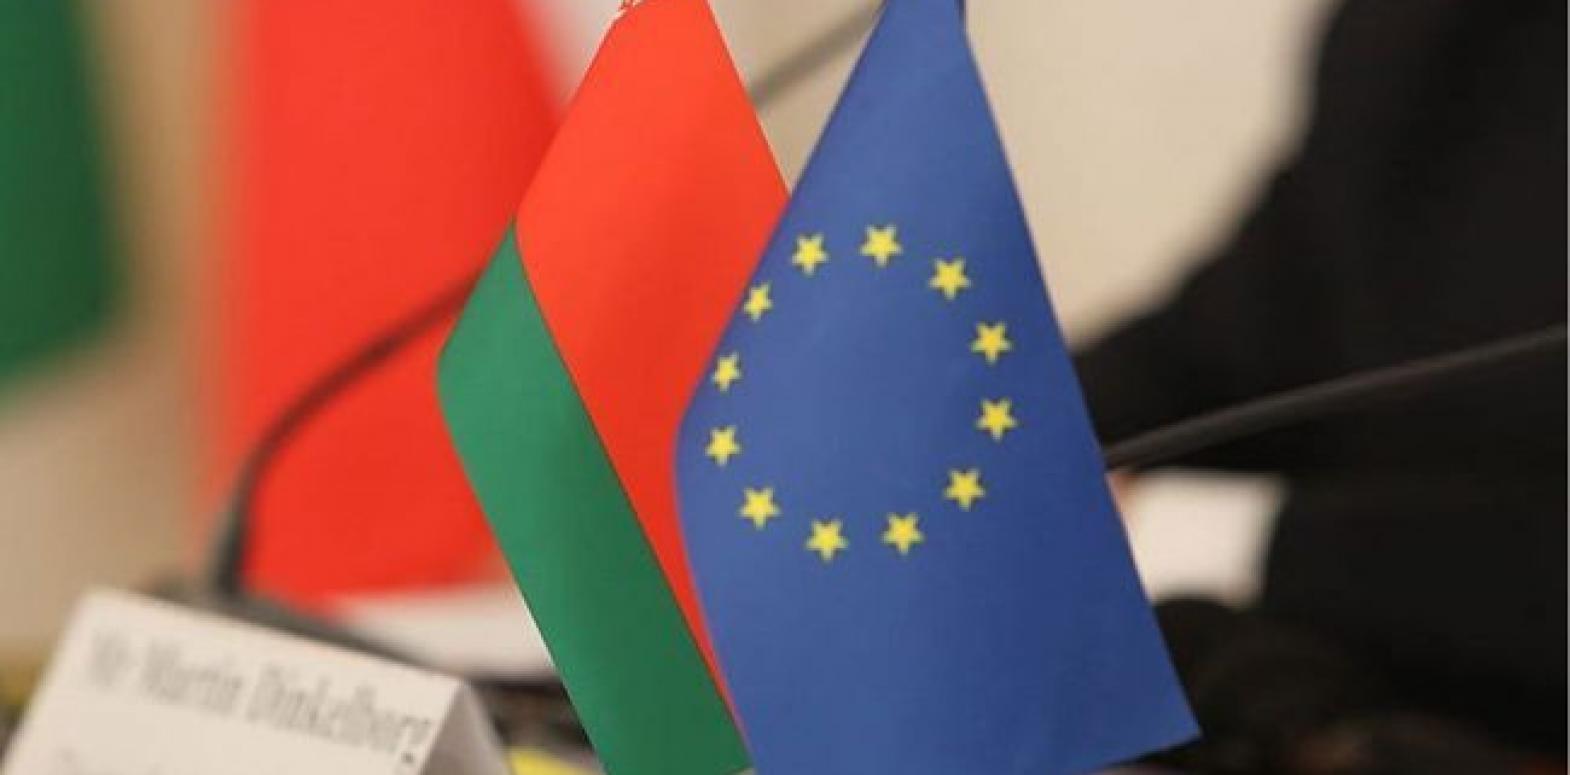 Беларусь, Евросоюз, МИД, Глаз, Лукашенко, Безвиз.